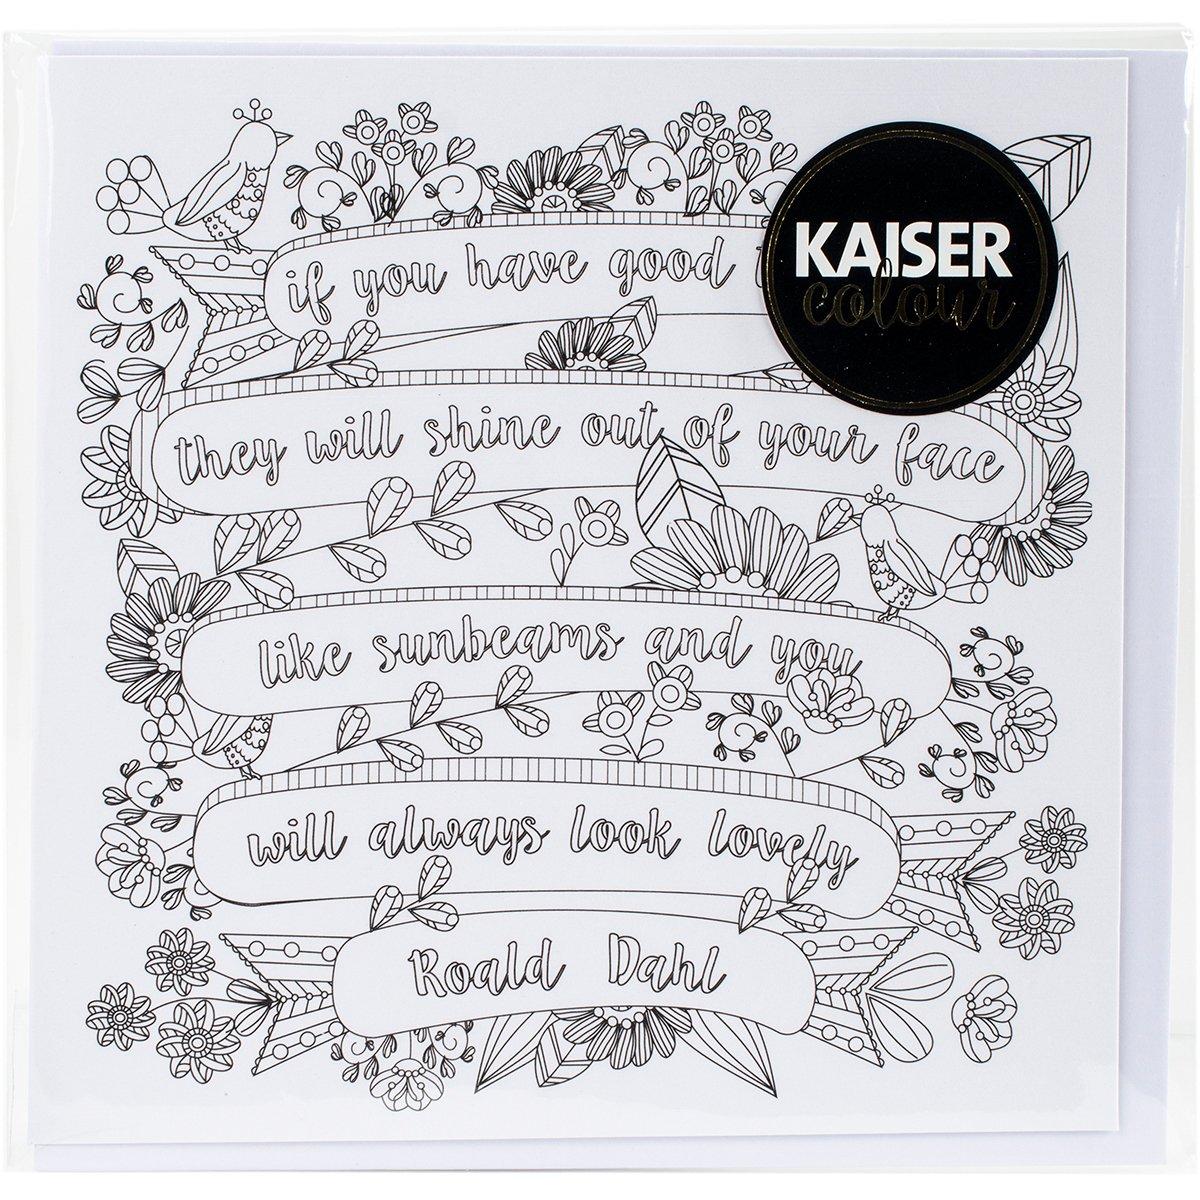 Kaisercraft Sunbeams KaiserColour Gift Card with Envelope, 6 x 6 6 x 6 CL1002